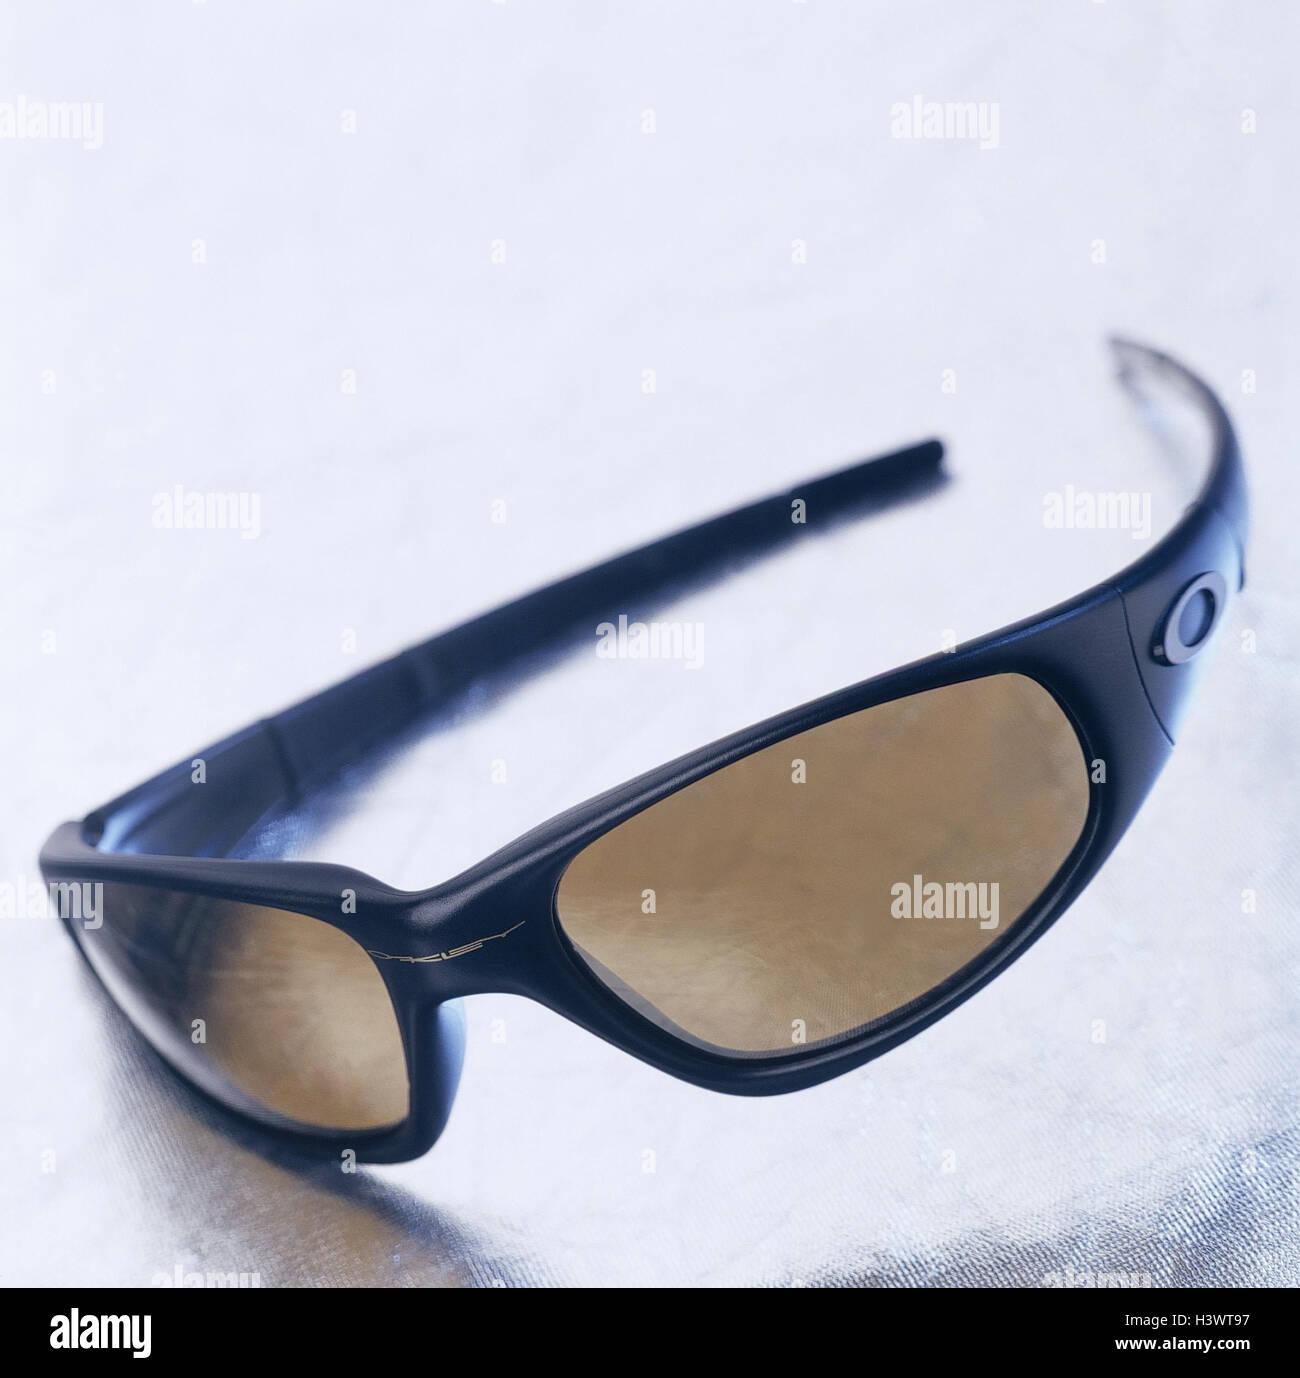 Oakley Sunglasses Stockfotos & Oakley Sunglasses Bilder - Alamy